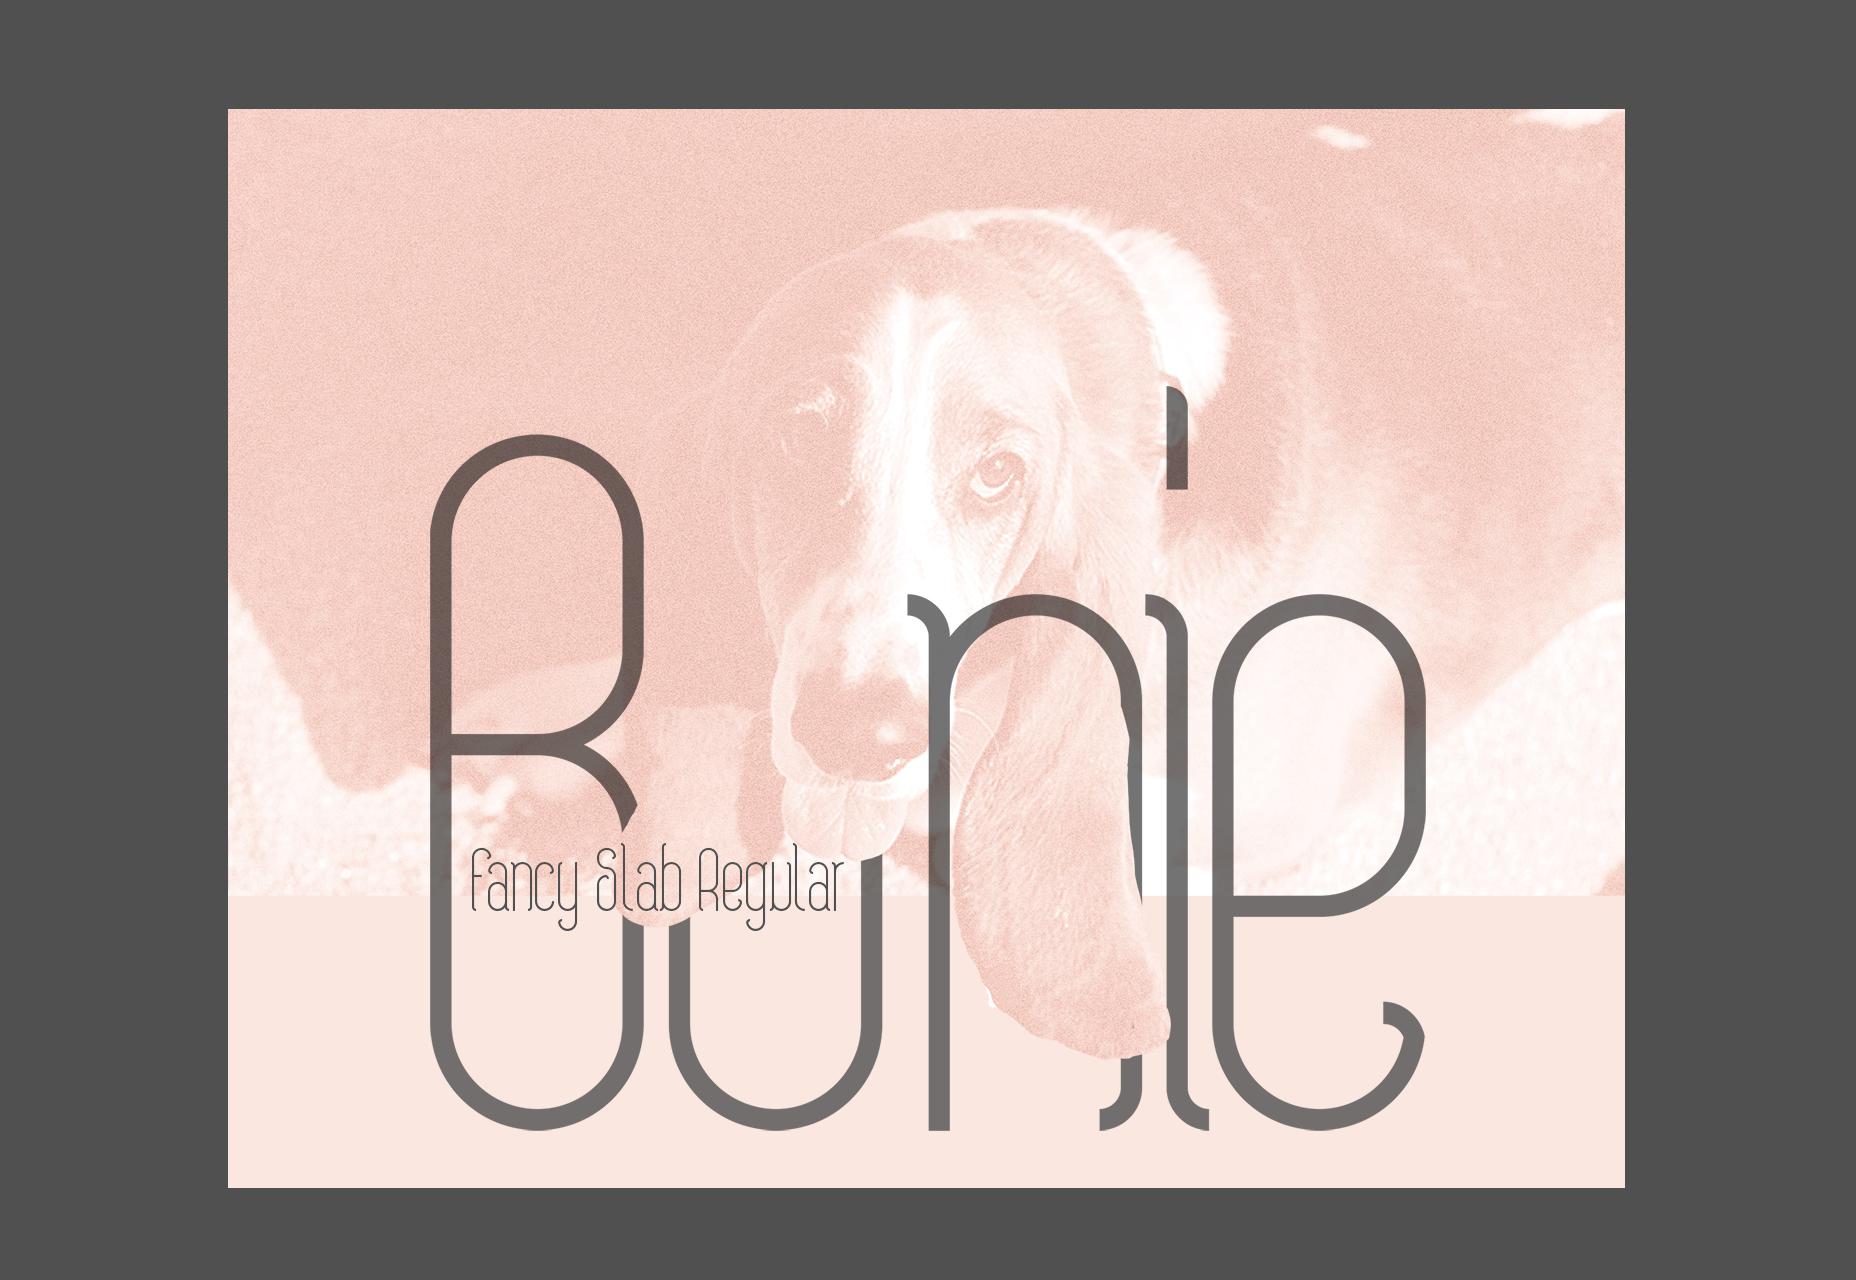 Bonie: Fancy Slab Regular Typeface